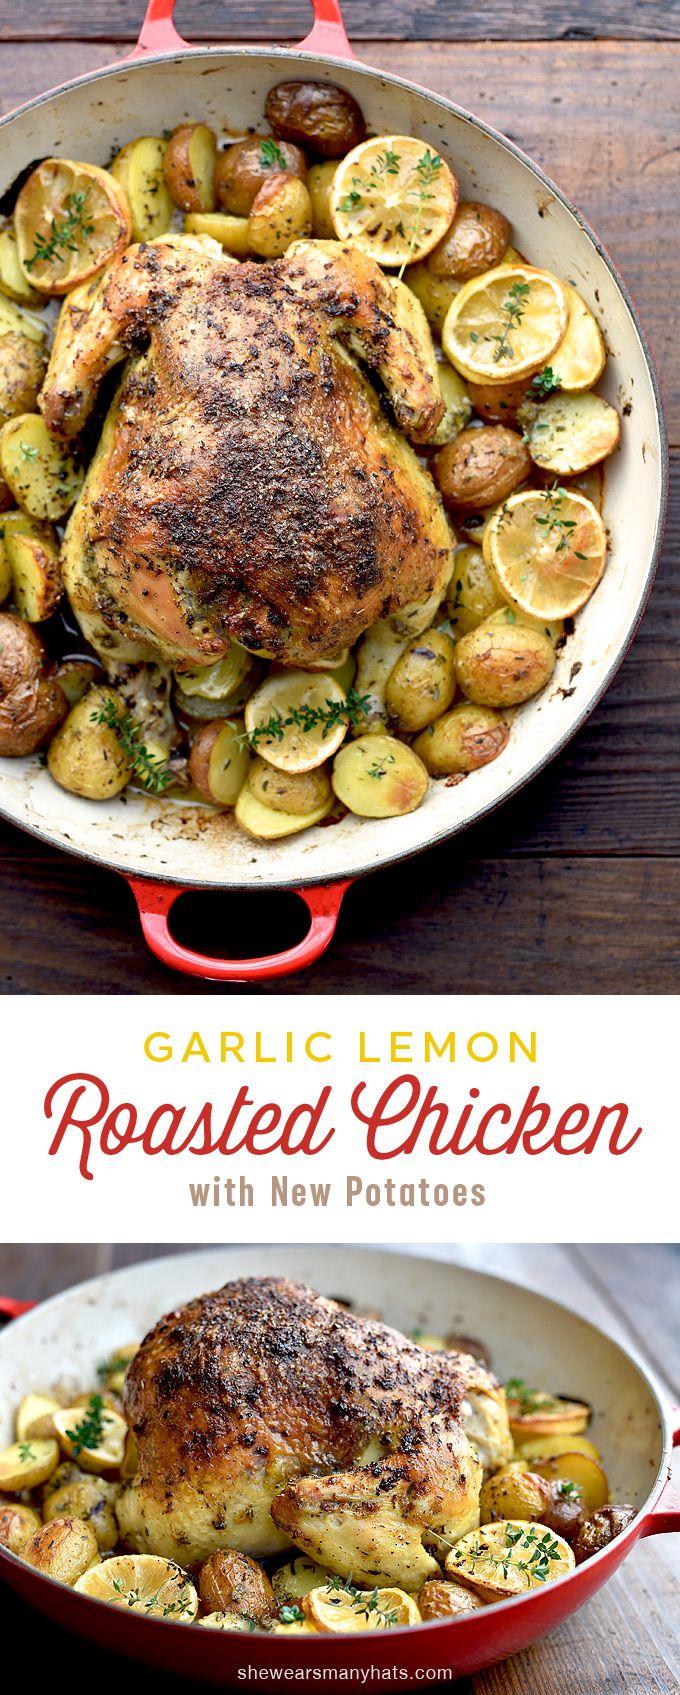 Roasted Garlic Lemon Chicken and Potatoes Recipe   shewearsmanyhats.com